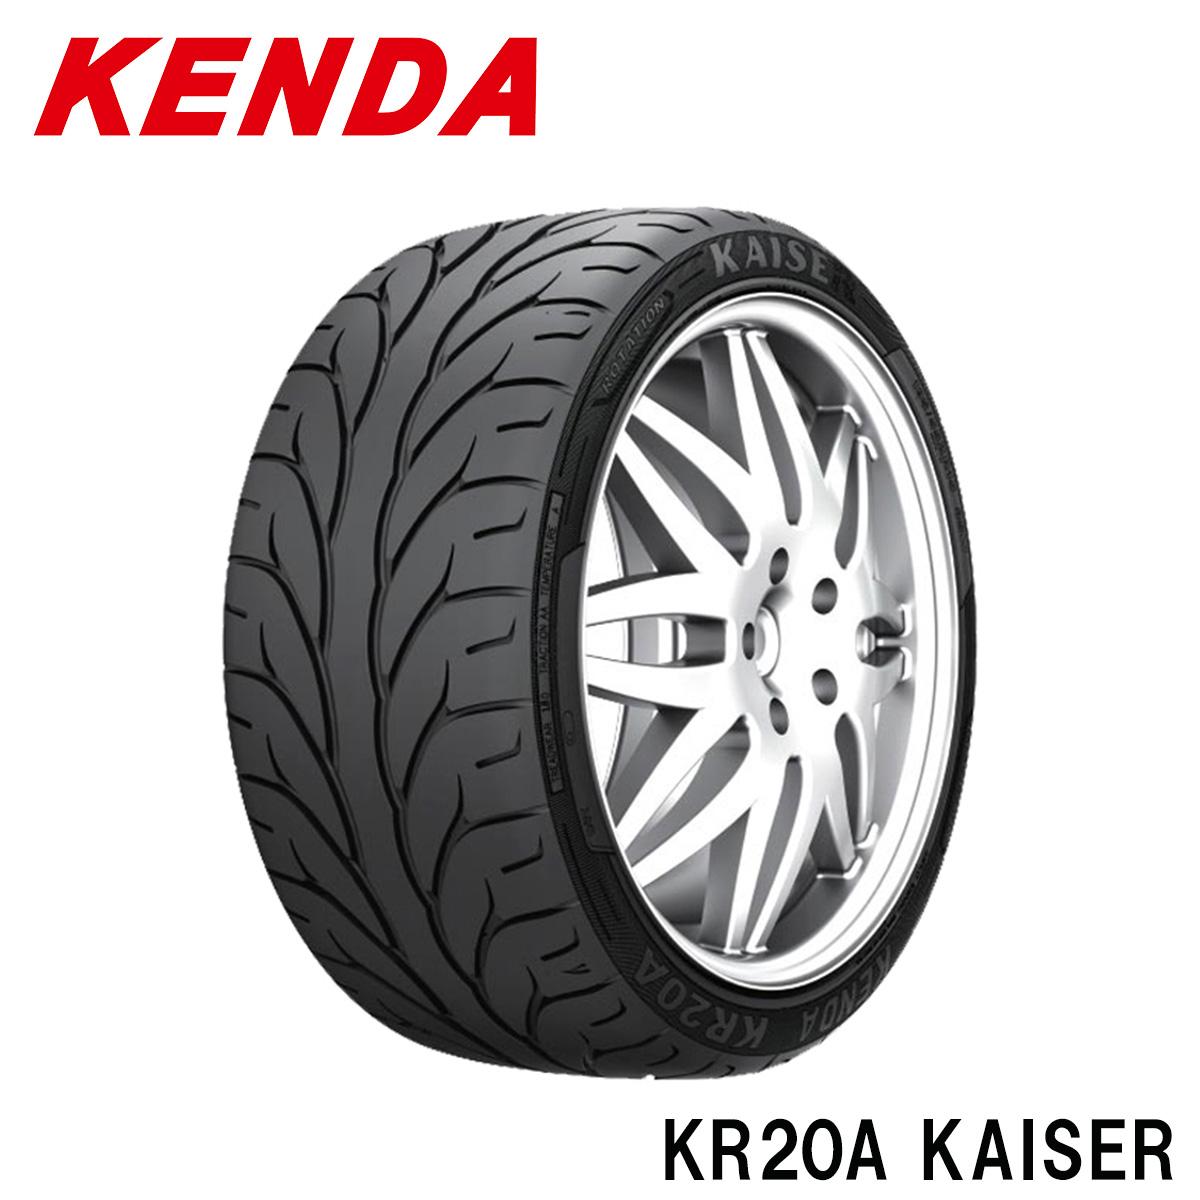 KENDA ケンダ サマータイヤ 4本 セット 17インチ 235/45R17 カイザー KAISER KR20A